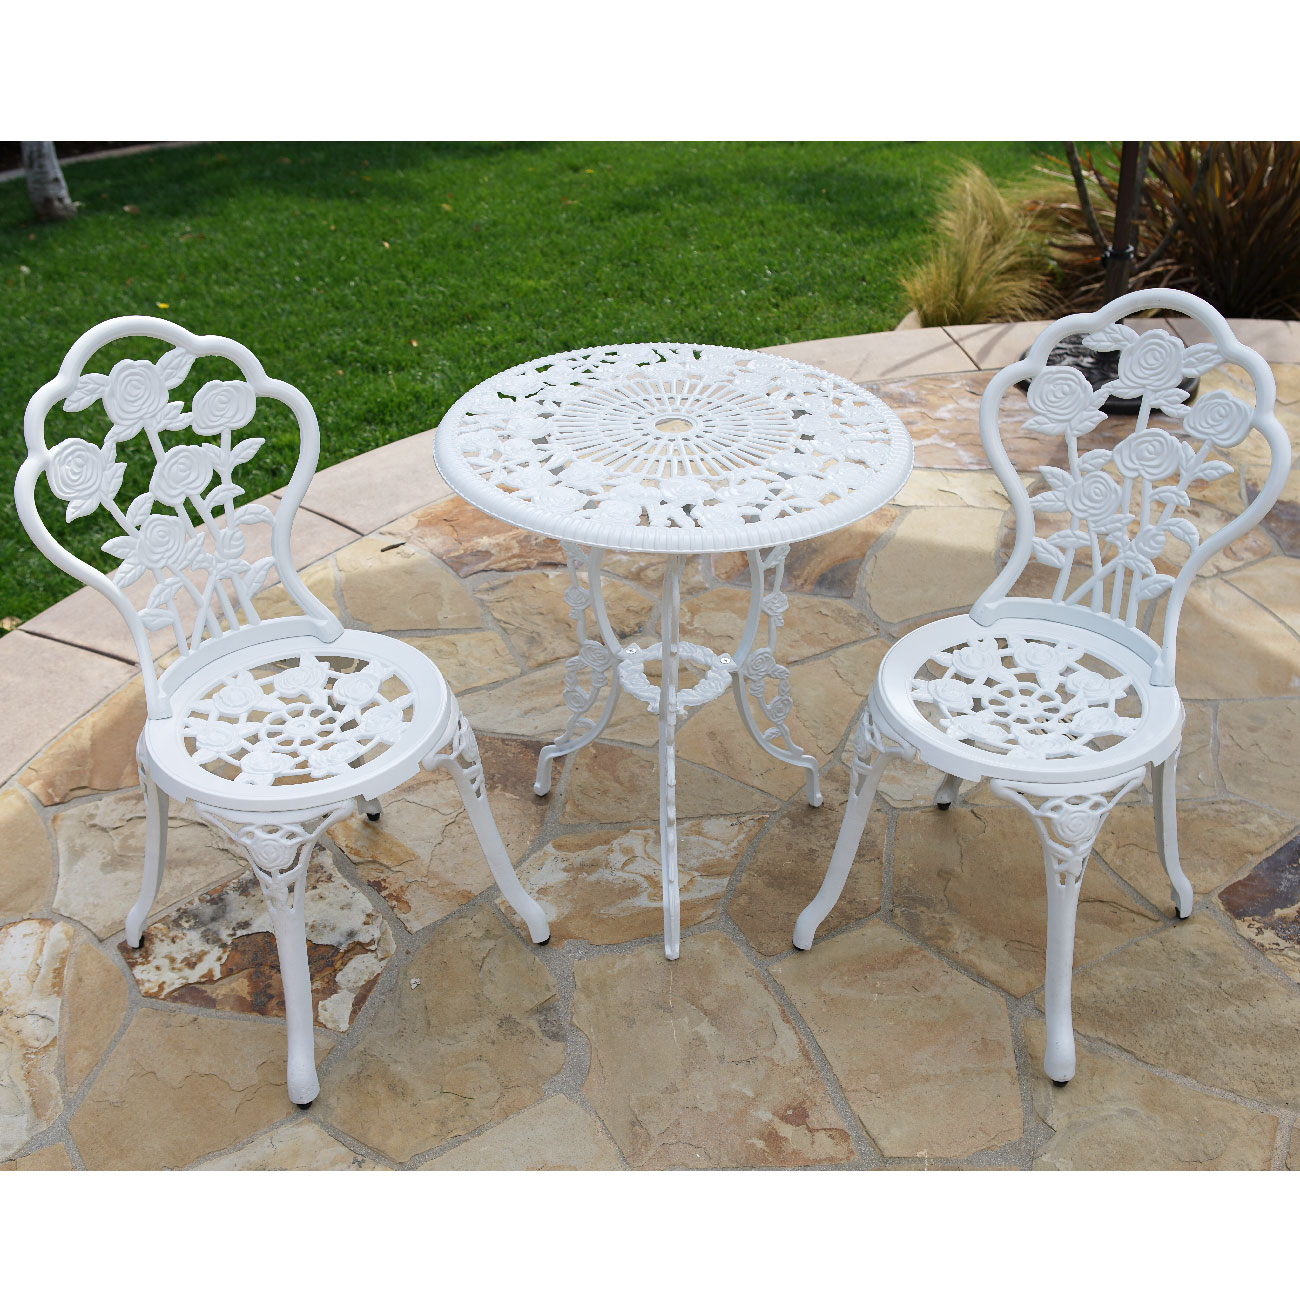 patio bistro table and chairs big bird plastic chair belleze 3 piece outdoor set rose design weather resistant round walmart com